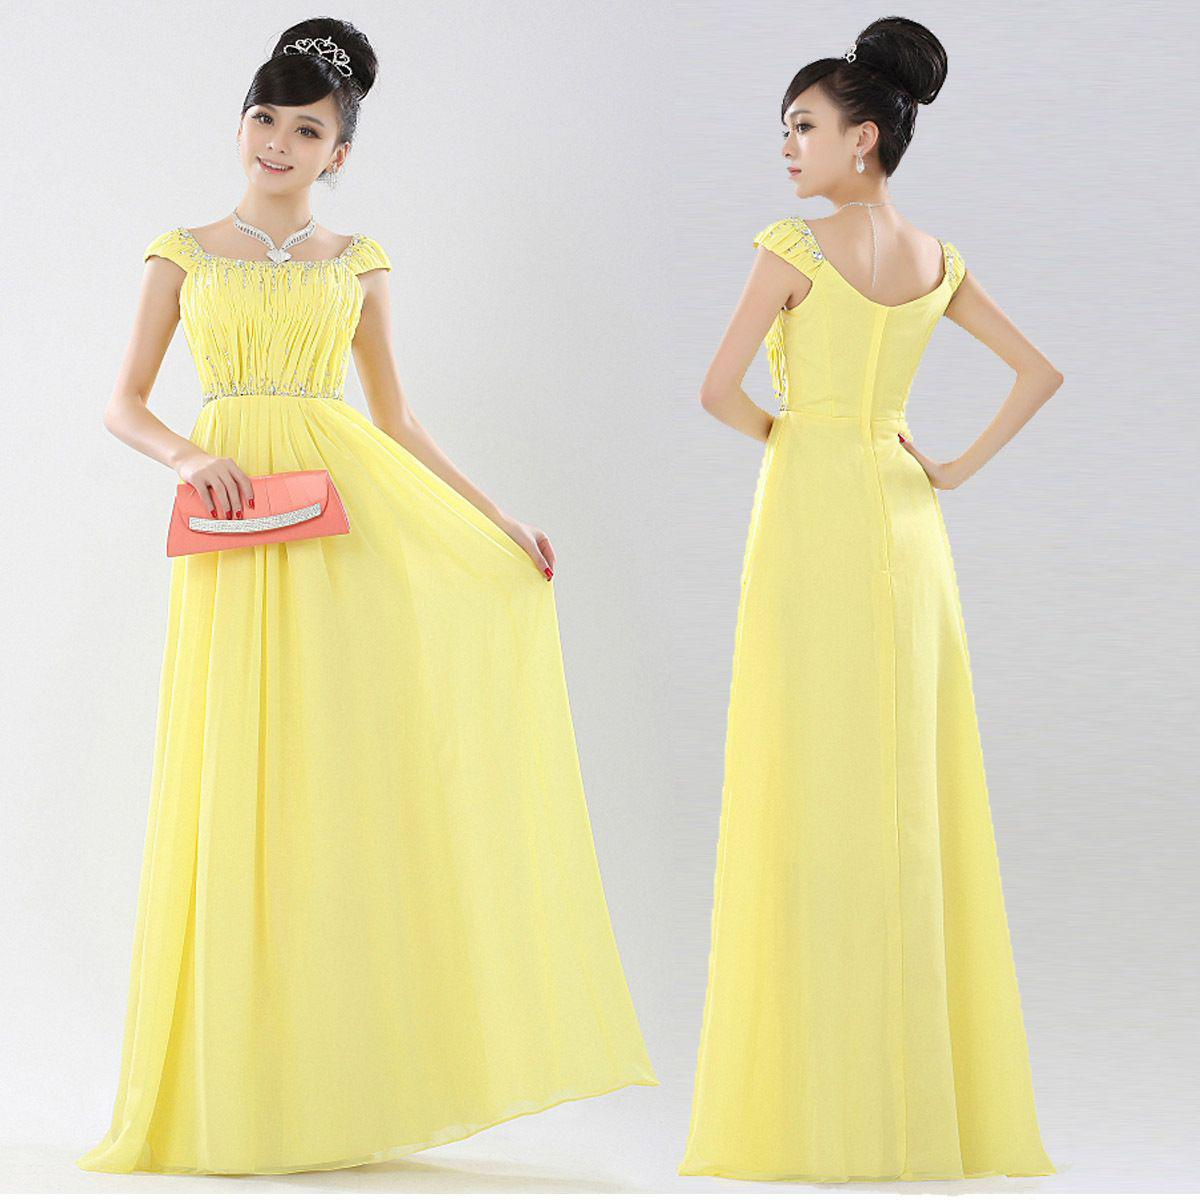 2 bp blogspot yellow wedding dress Wholesale Evening Dresses Buy Luxury Yellow Wedding Dress Bridal